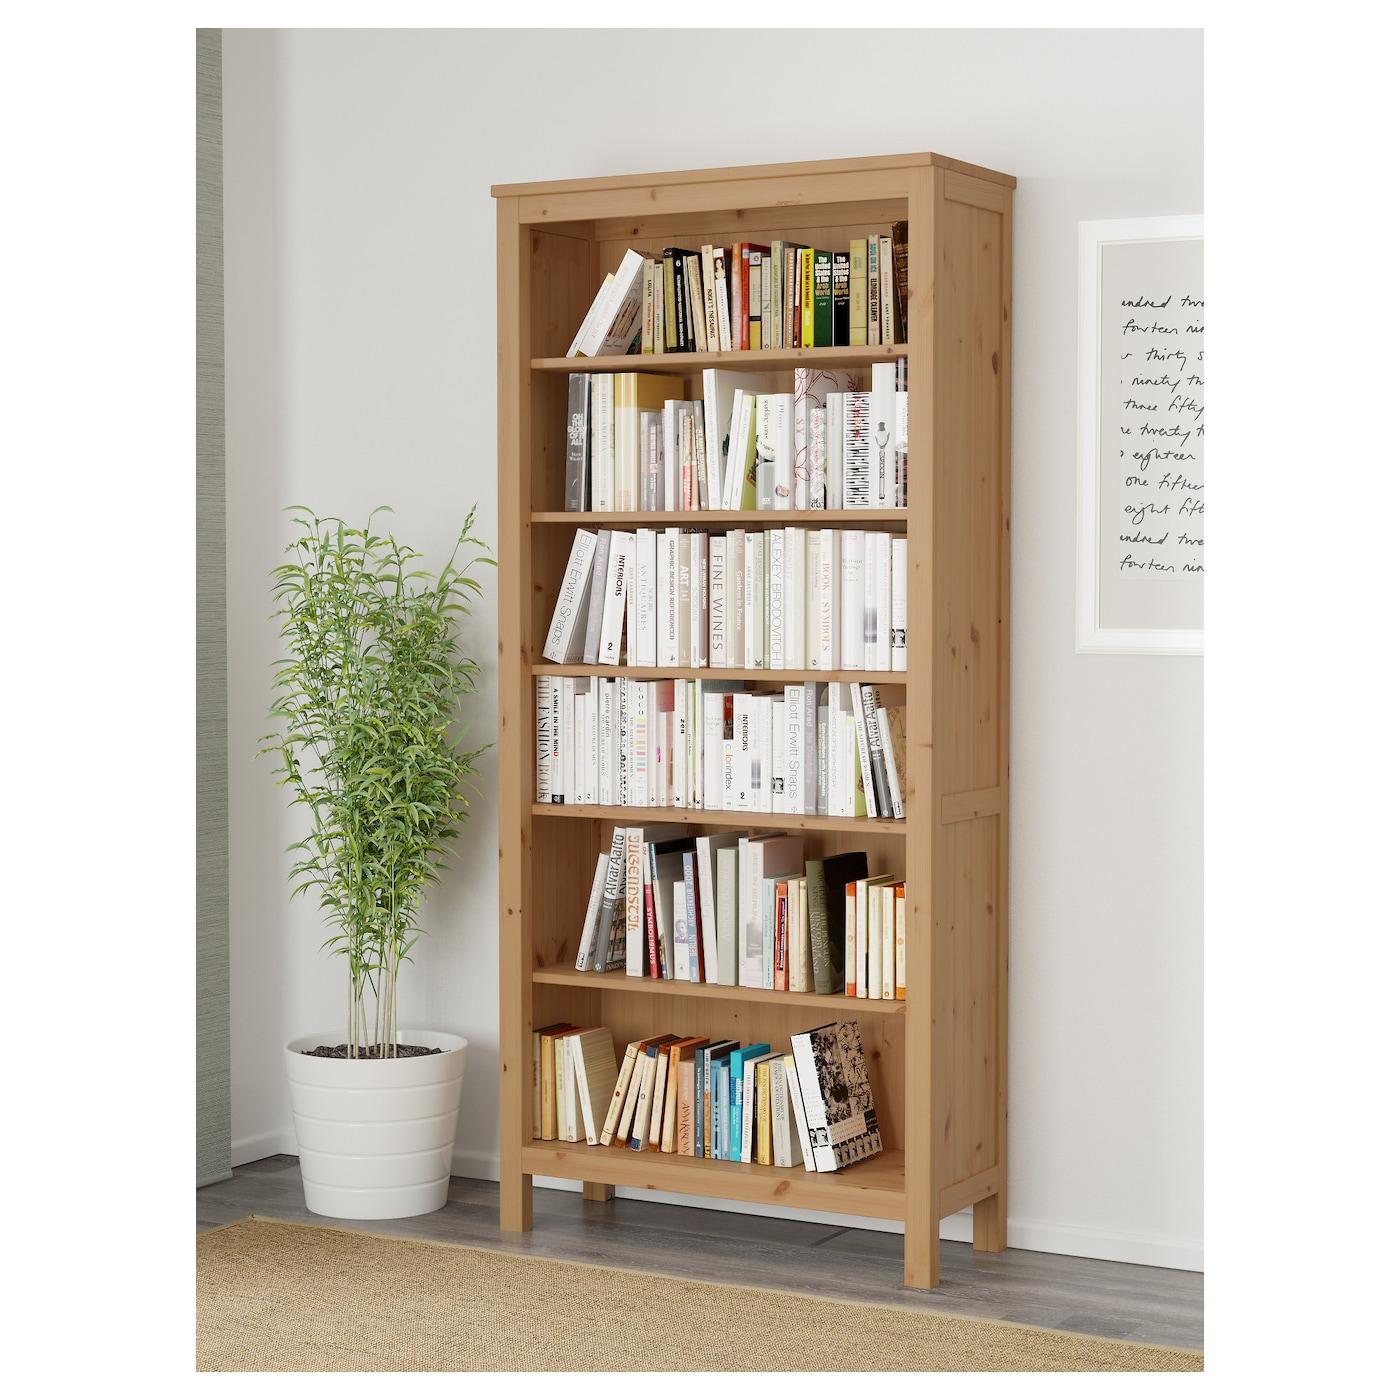 https://www.ikea.com/be/nl/images/products/hemnes-boekenkast-lichtbruin__0394579_pe561402_s5.jpg